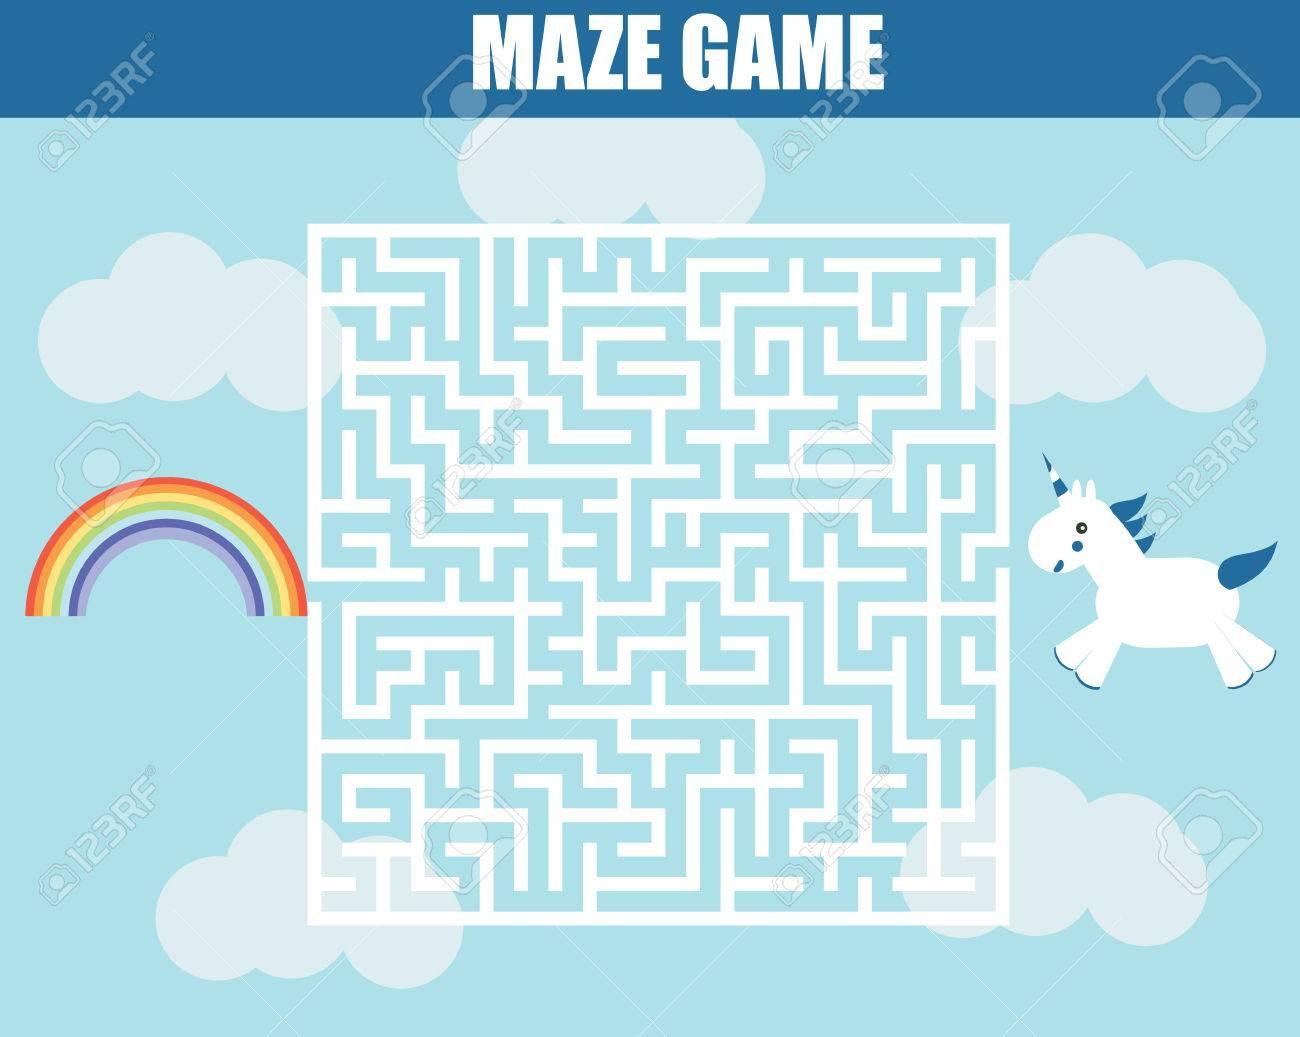 Maze Children Game Help The Unicorn Girl Go Through The Labyrinth